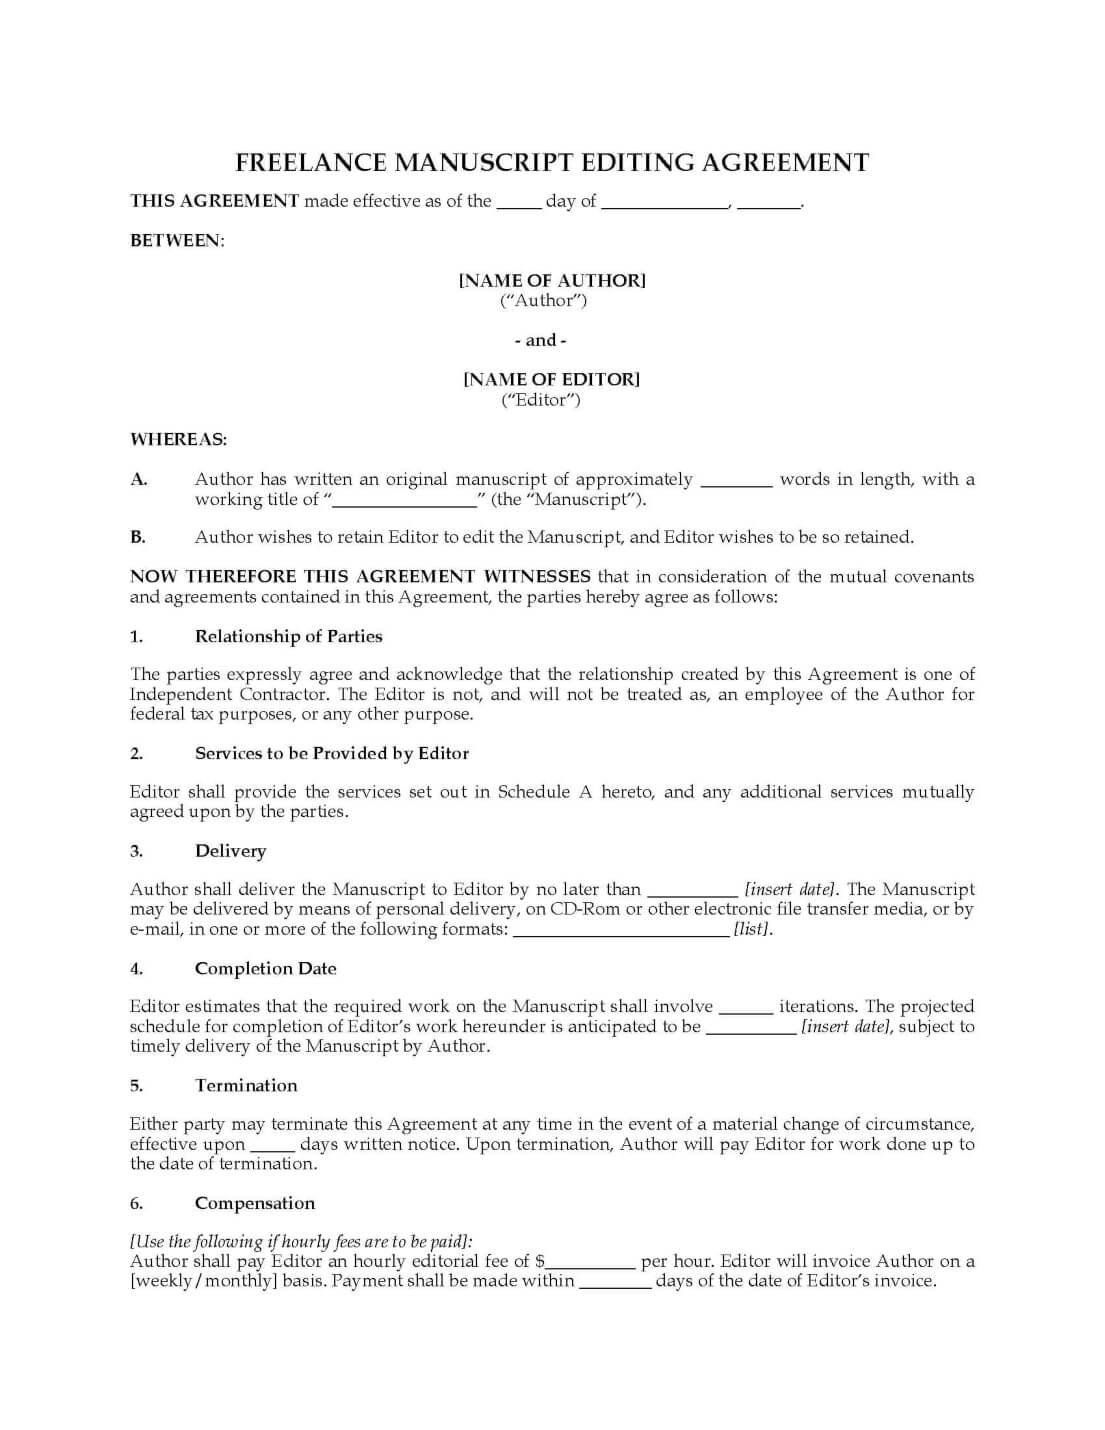 Freelance manuscript editing agreement